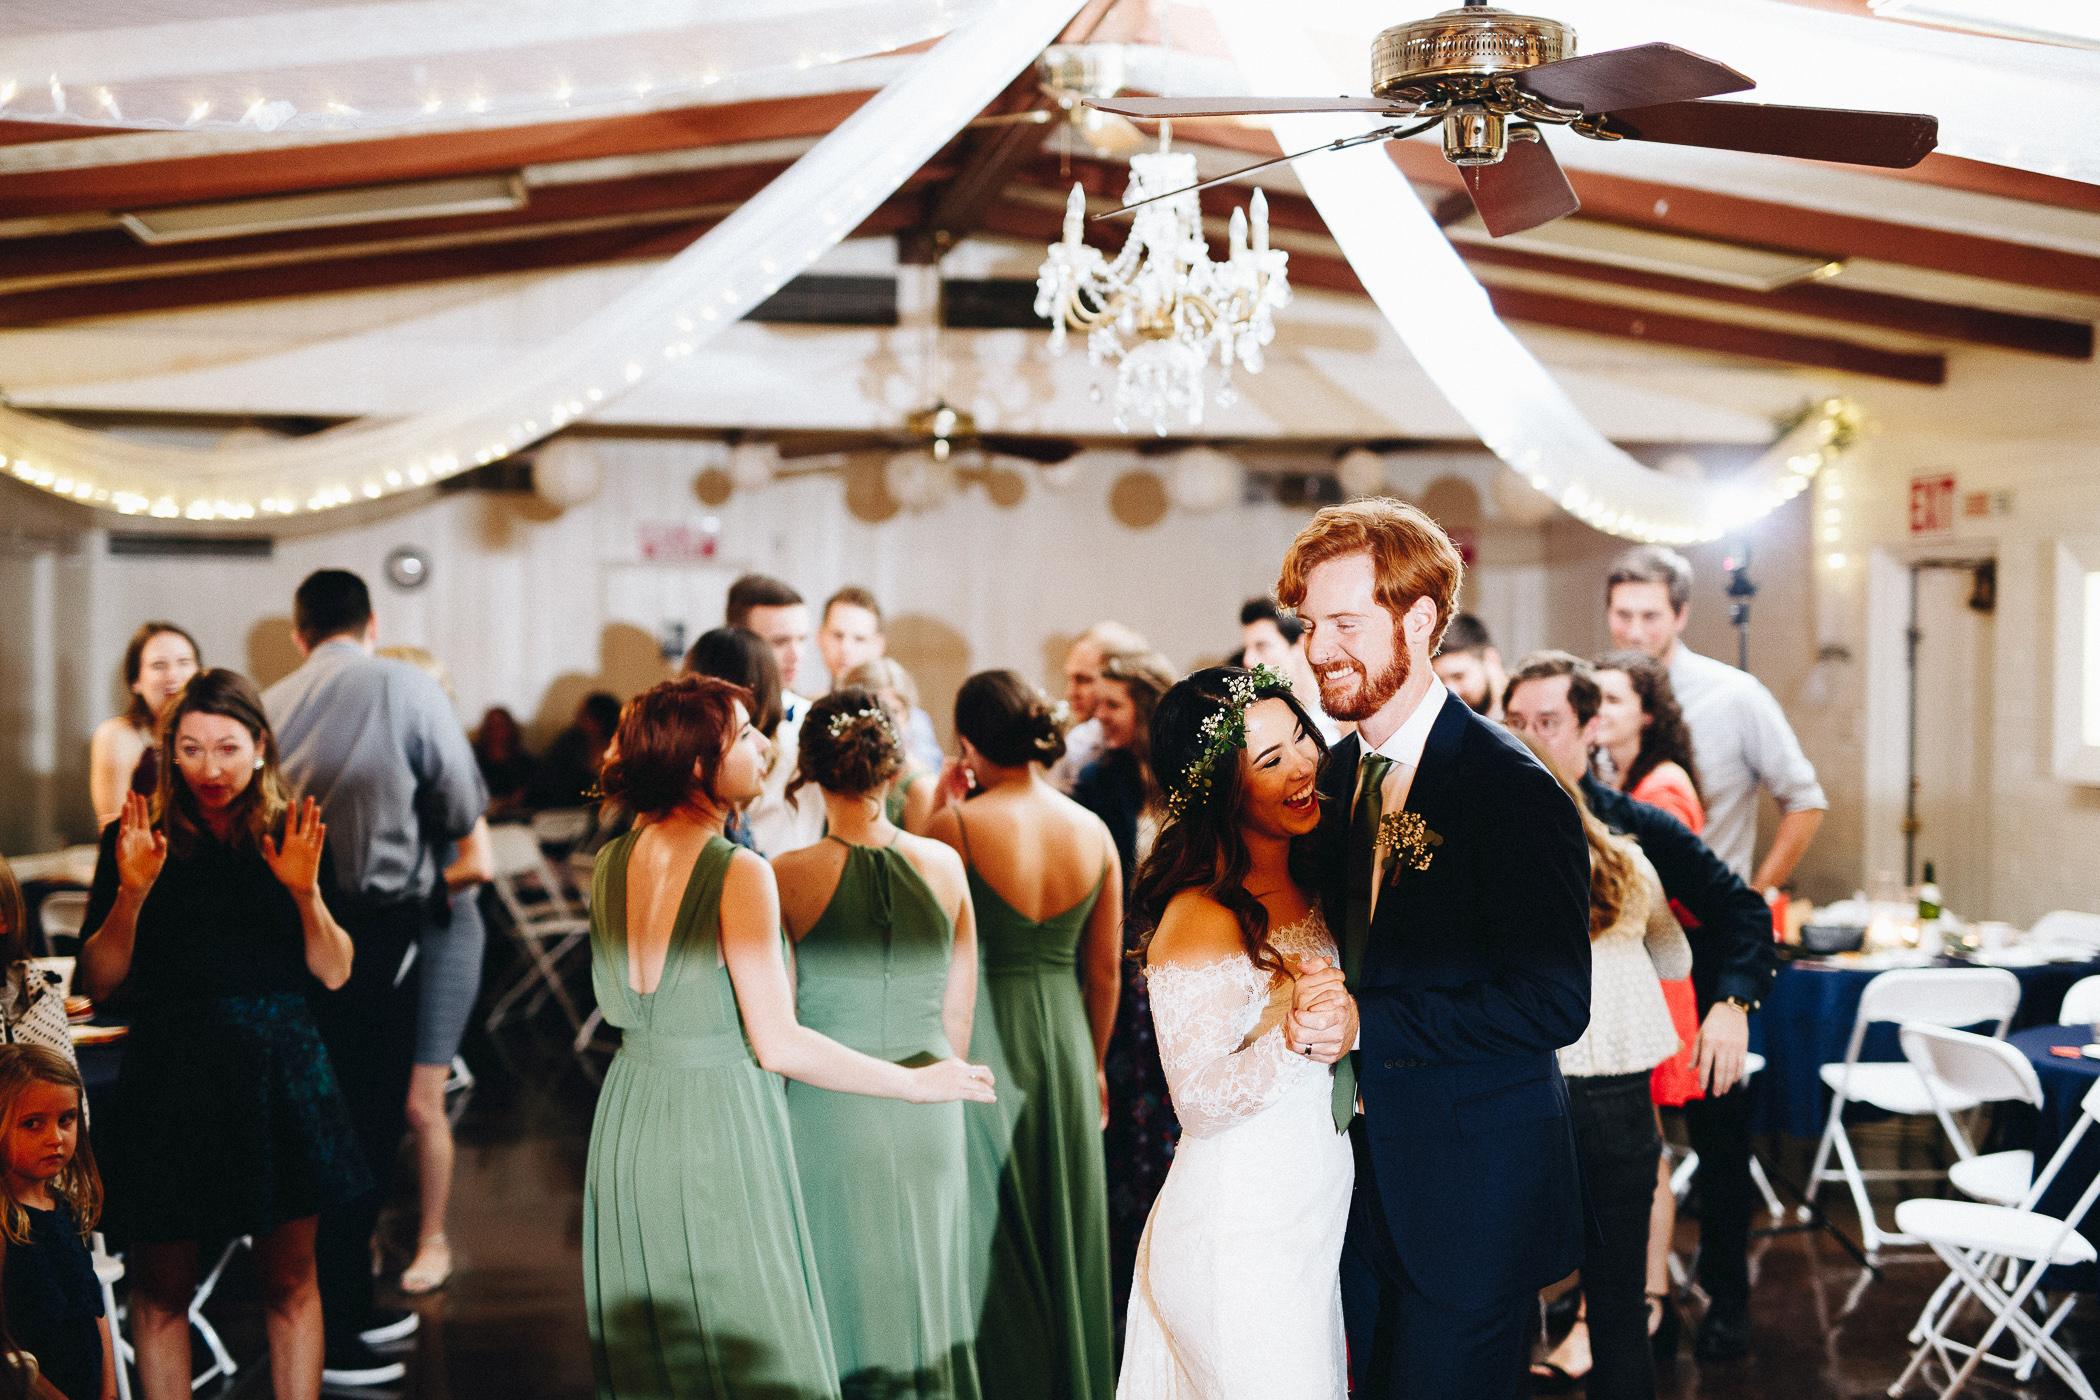 181104-Luxium-Weddings-Arizona-@matt__Le-Brandon-Kariana-Phoenix-Valley-Garden-Center-1142.jpg